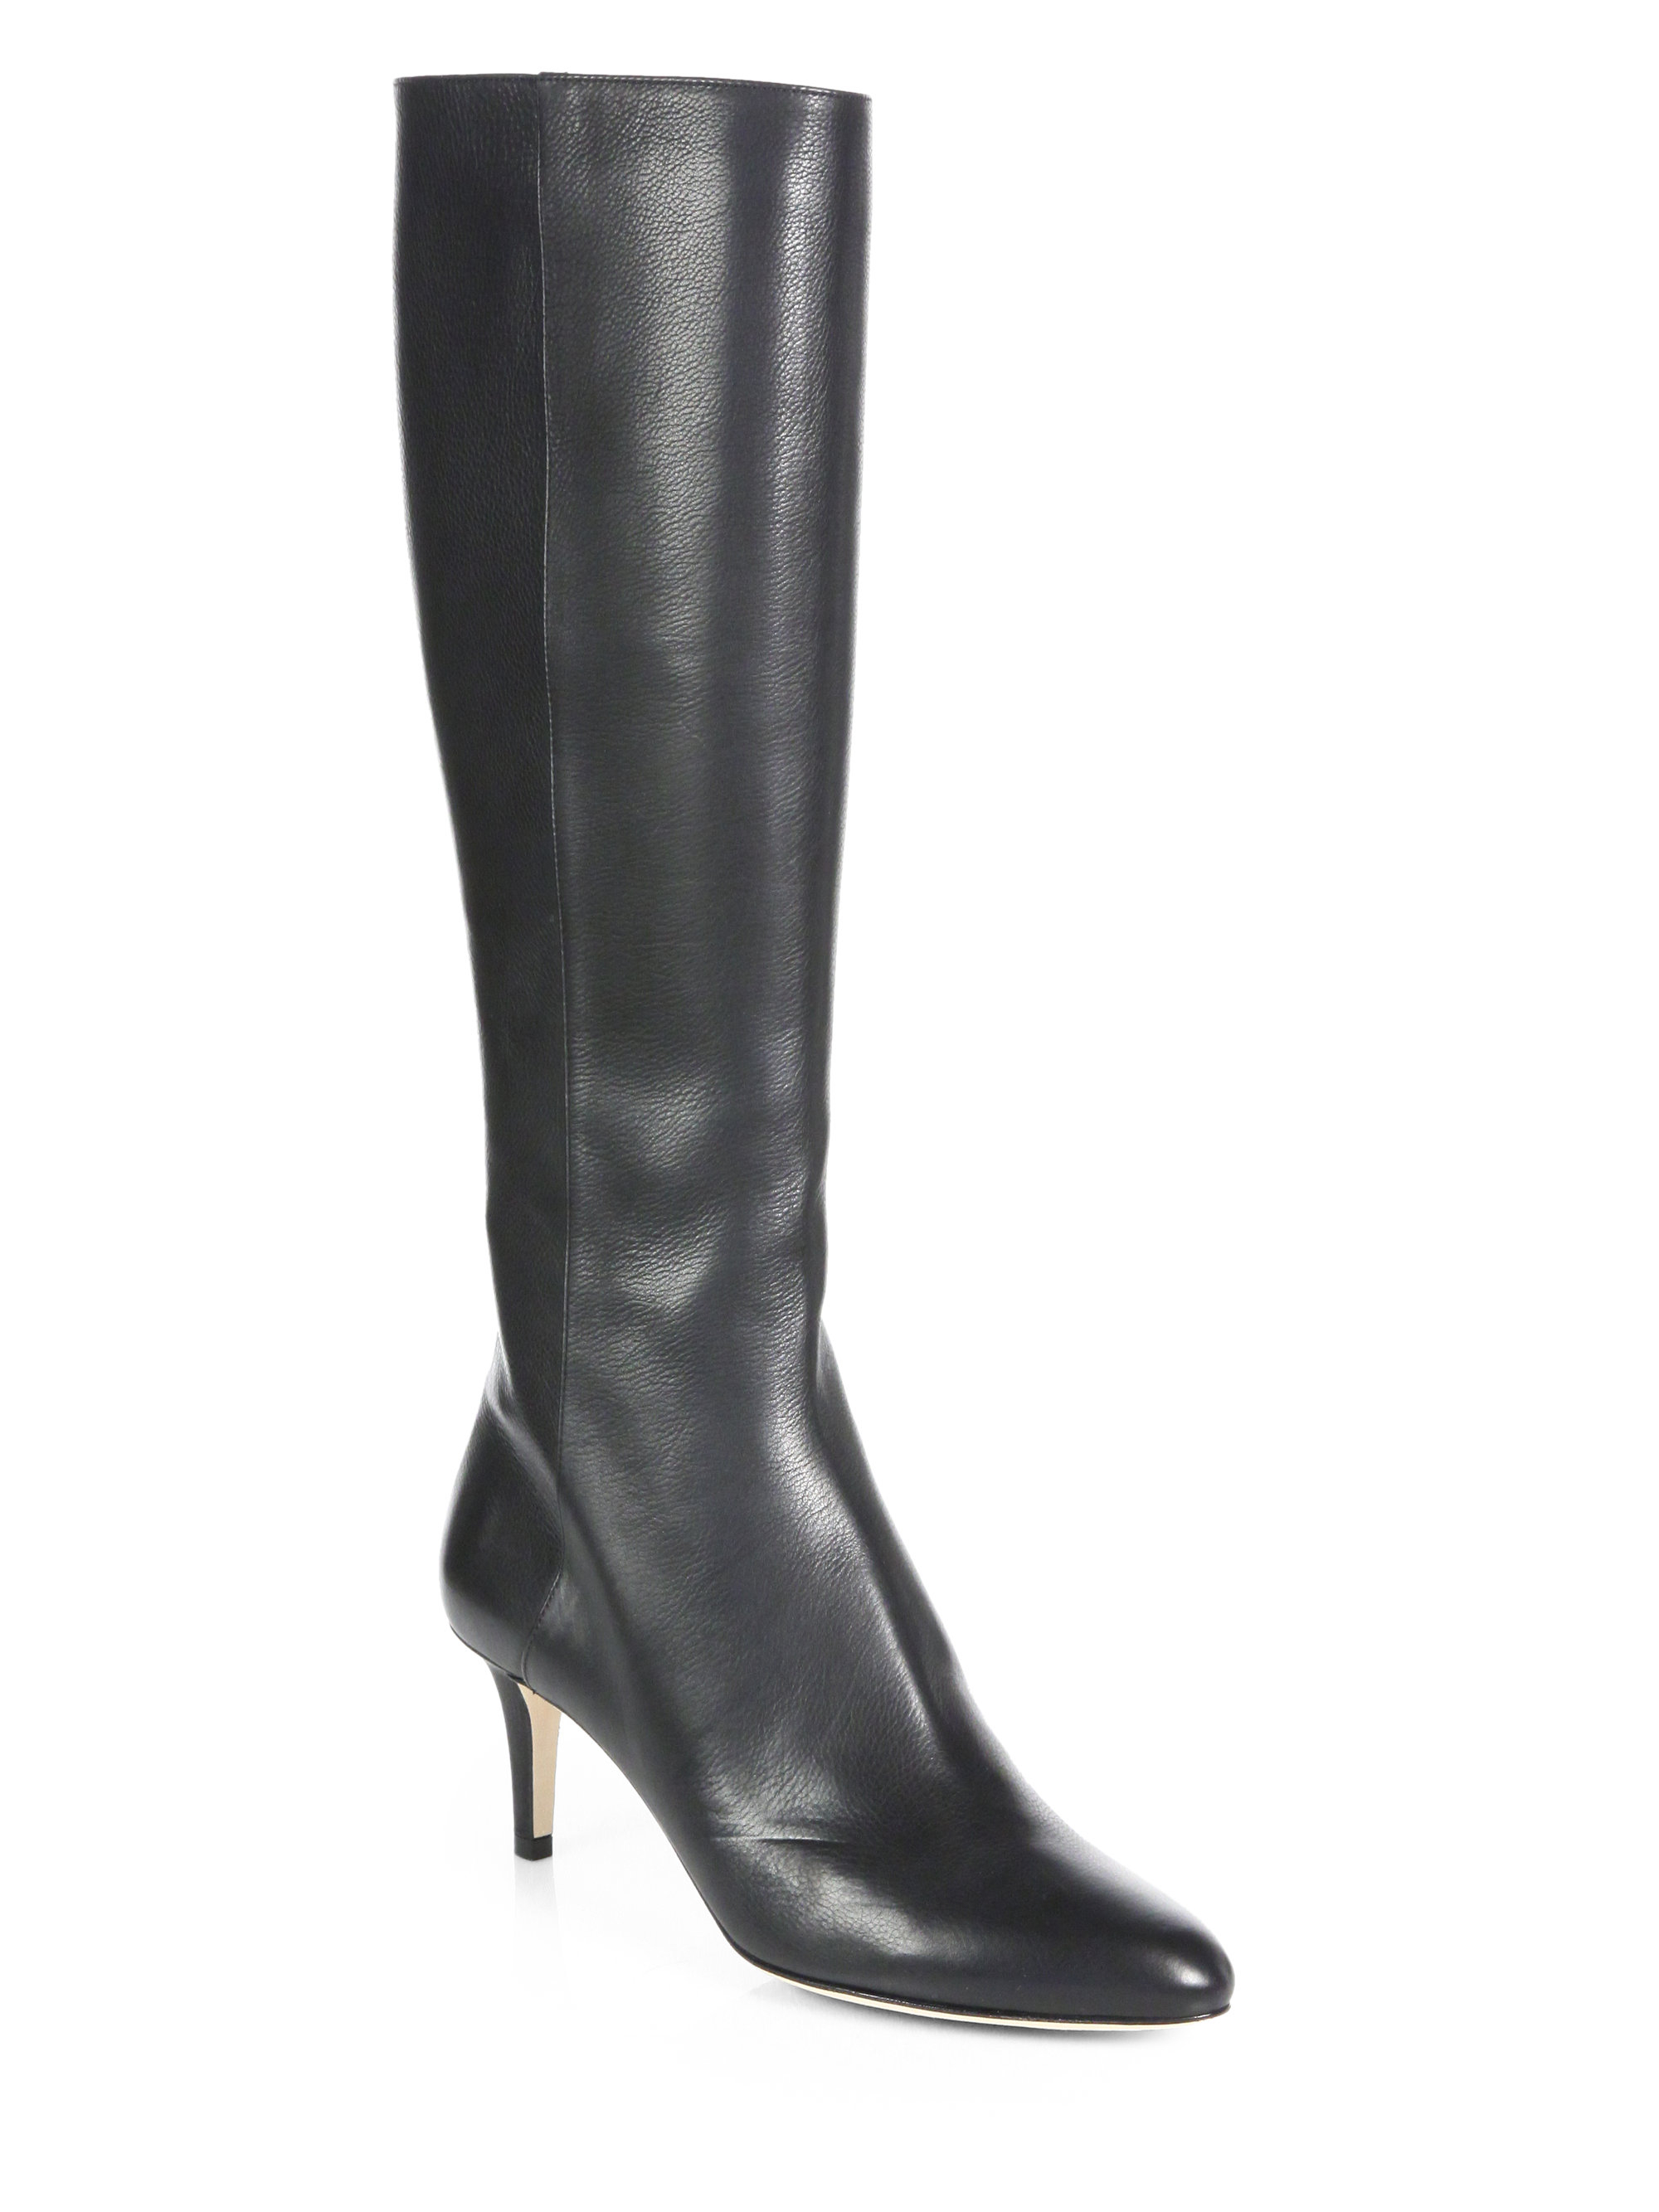 Jimmy Choo Gem Leather Knee-high Boots